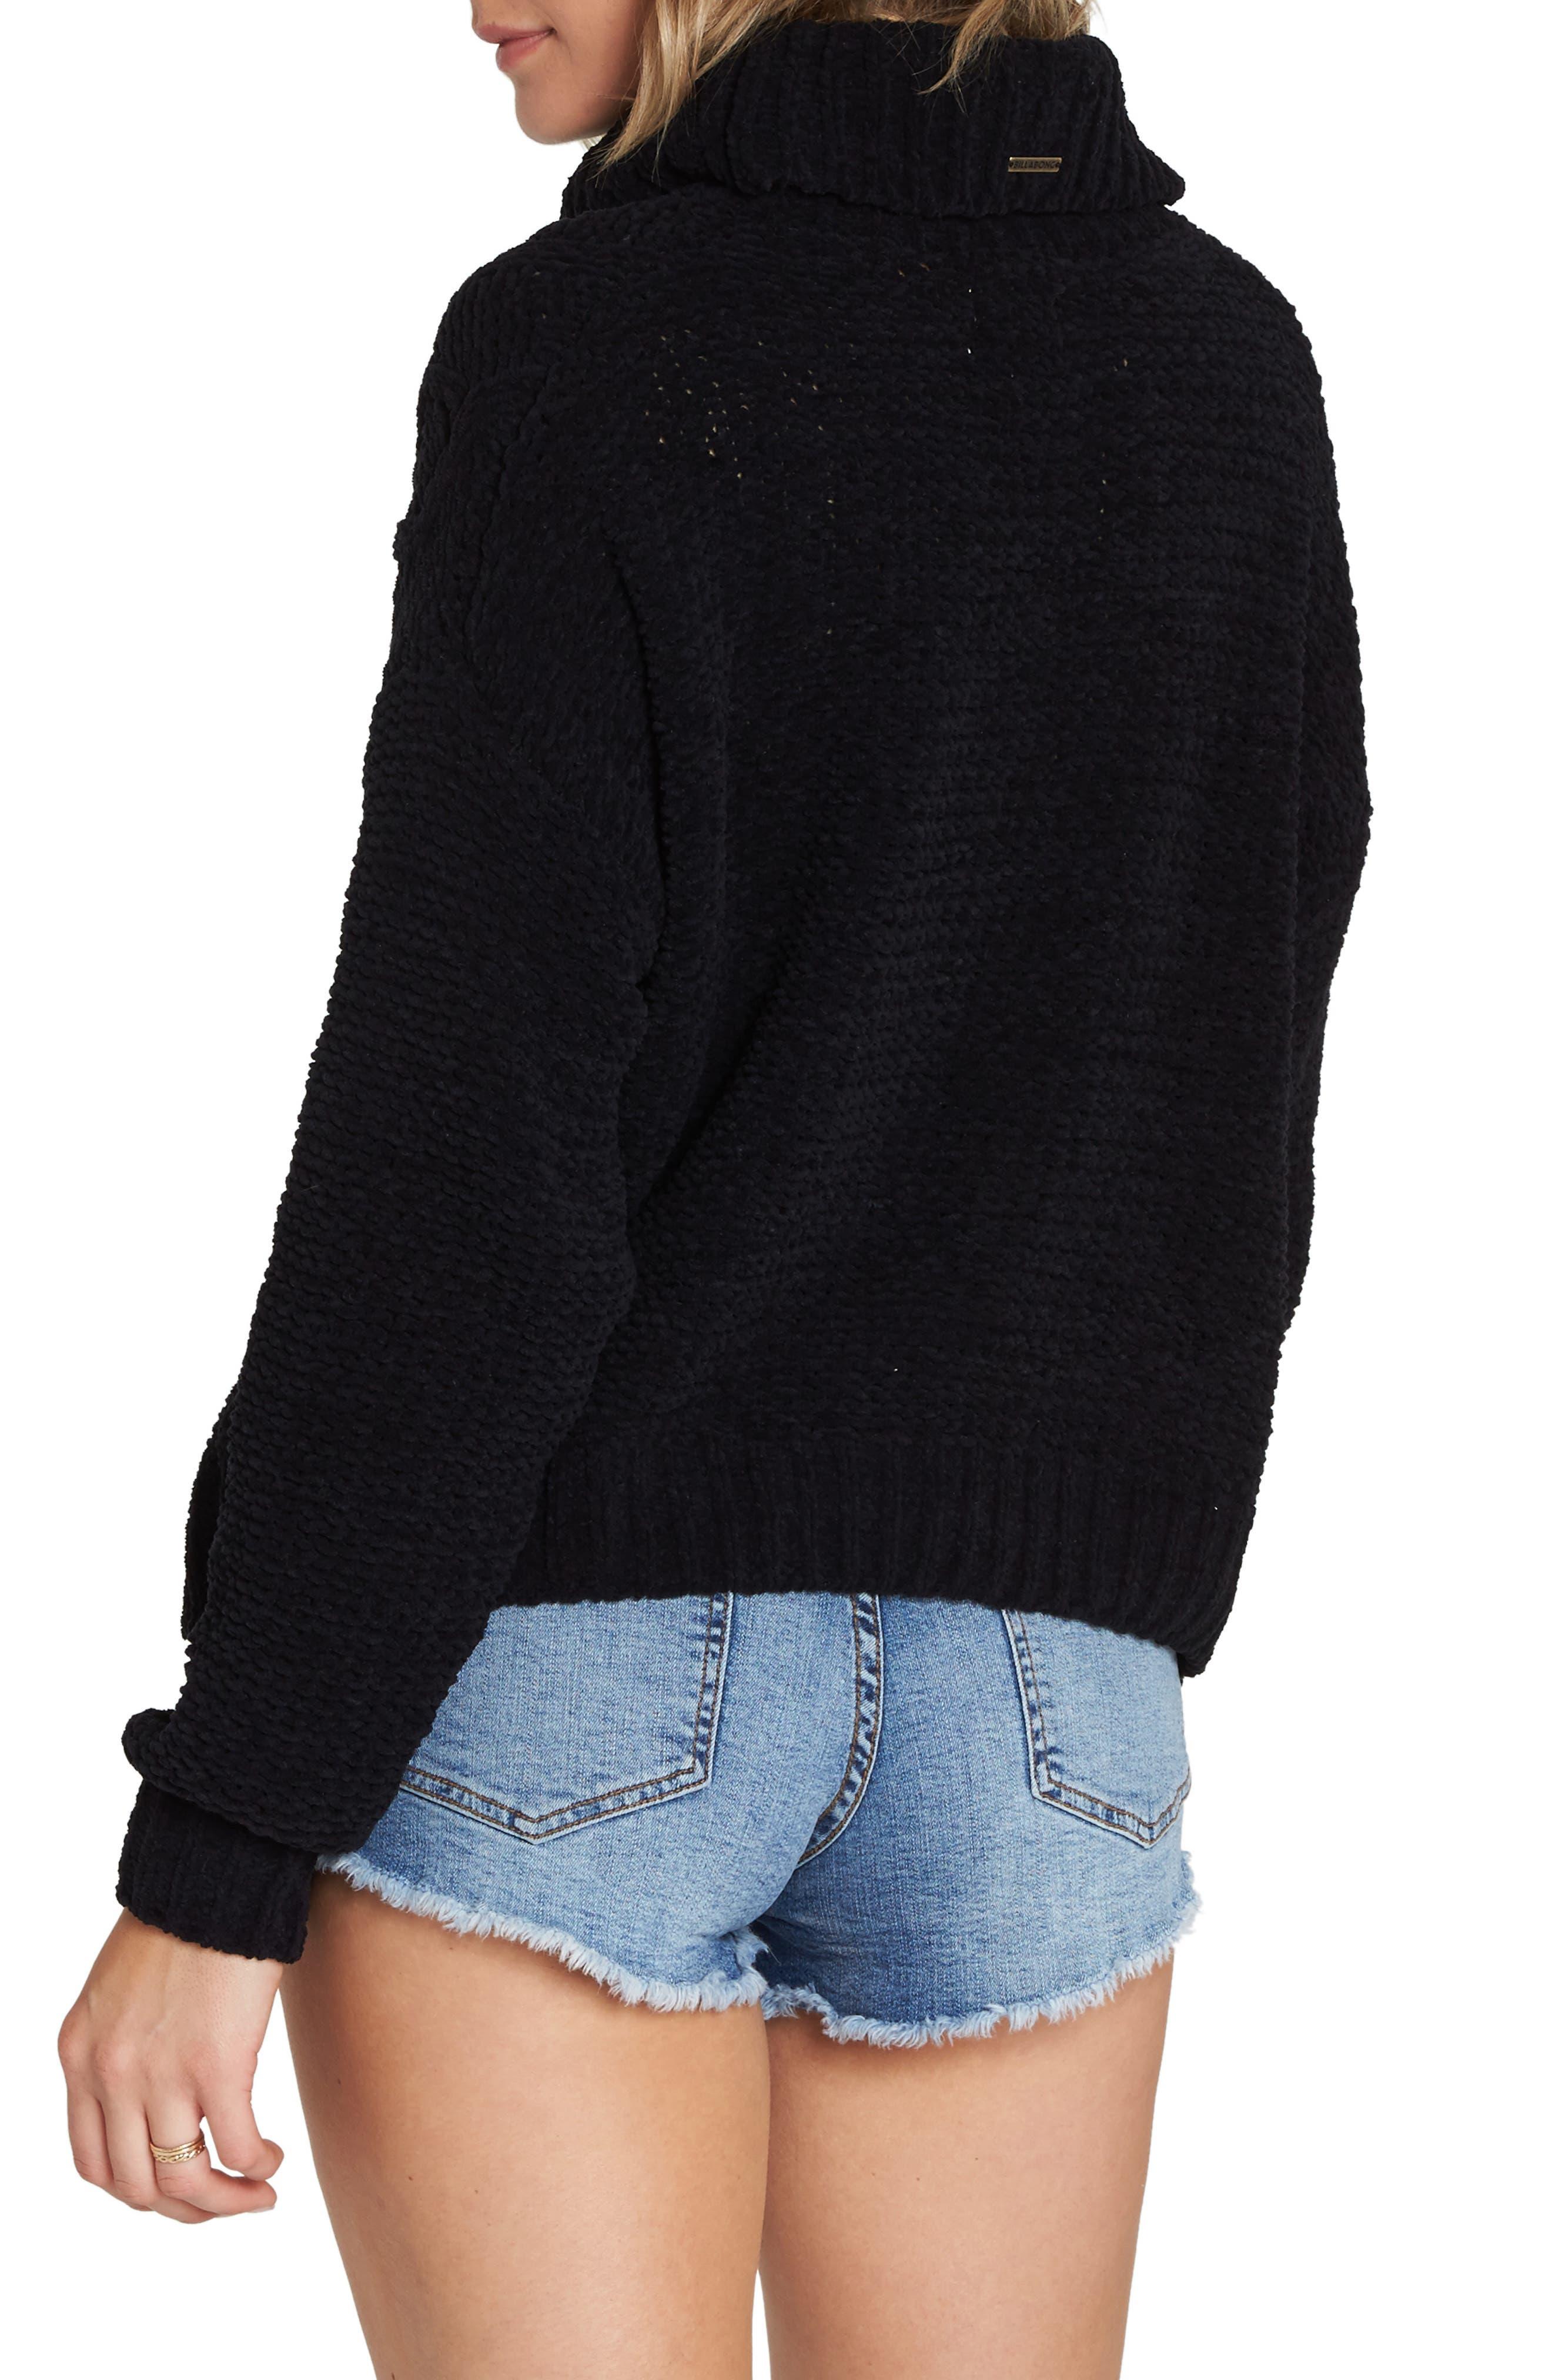 Cable Knit Turtleneck Sweater,                             Alternate thumbnail 2, color,                             001